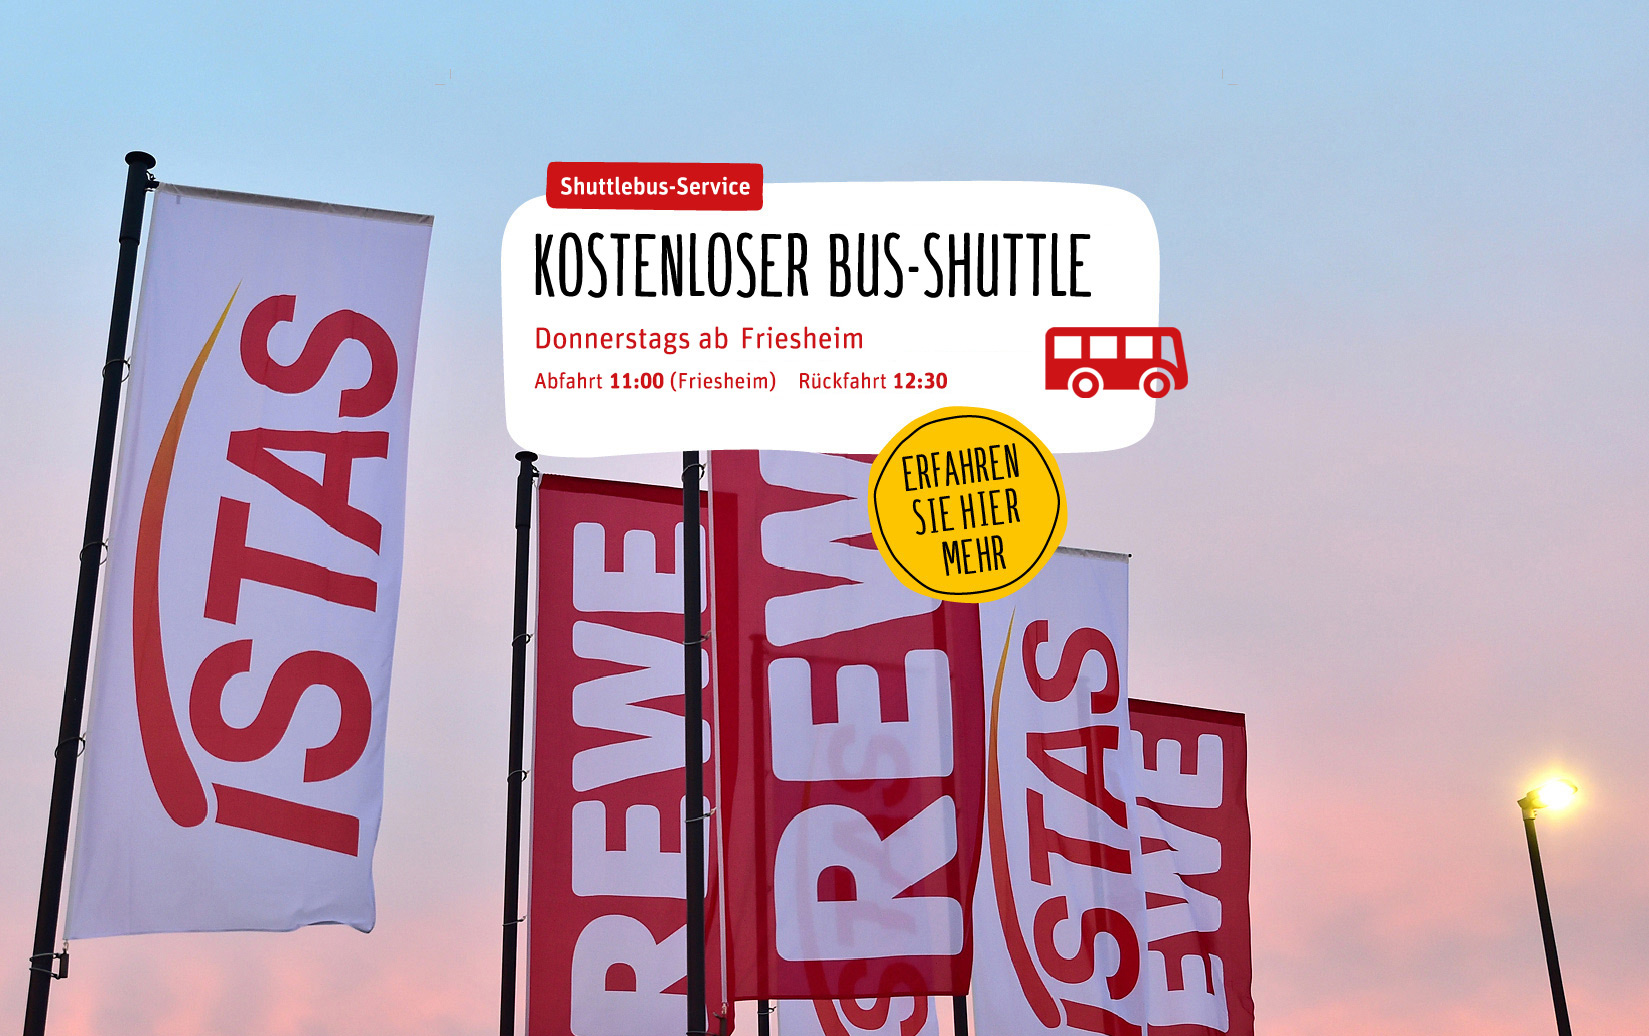 Shuttleservice nach Lechenich